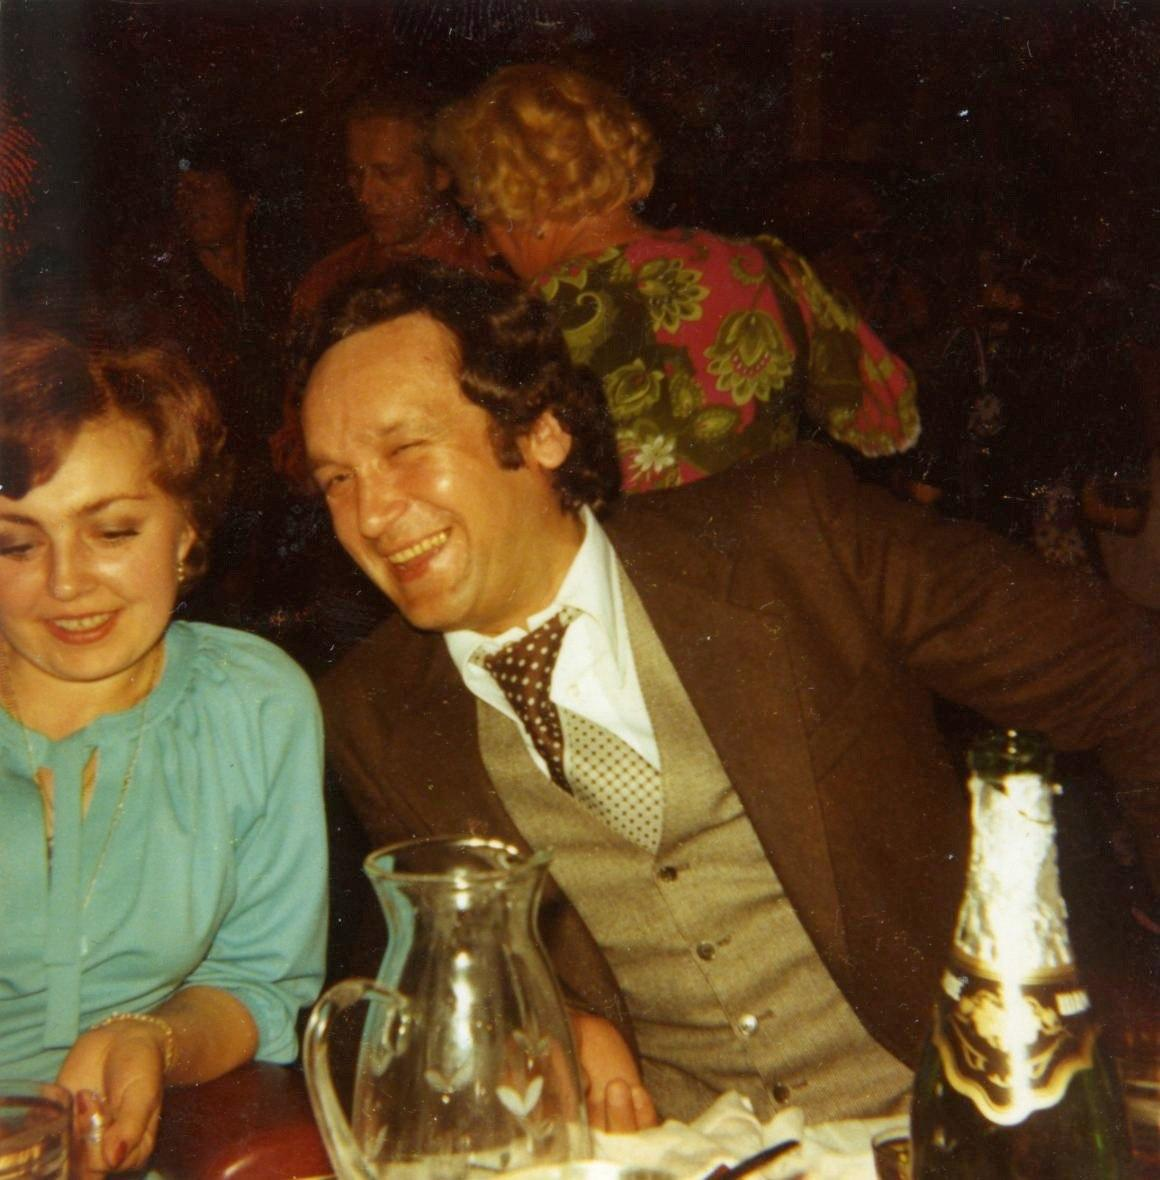 Феоктистов, конец 70-х, из архива автора